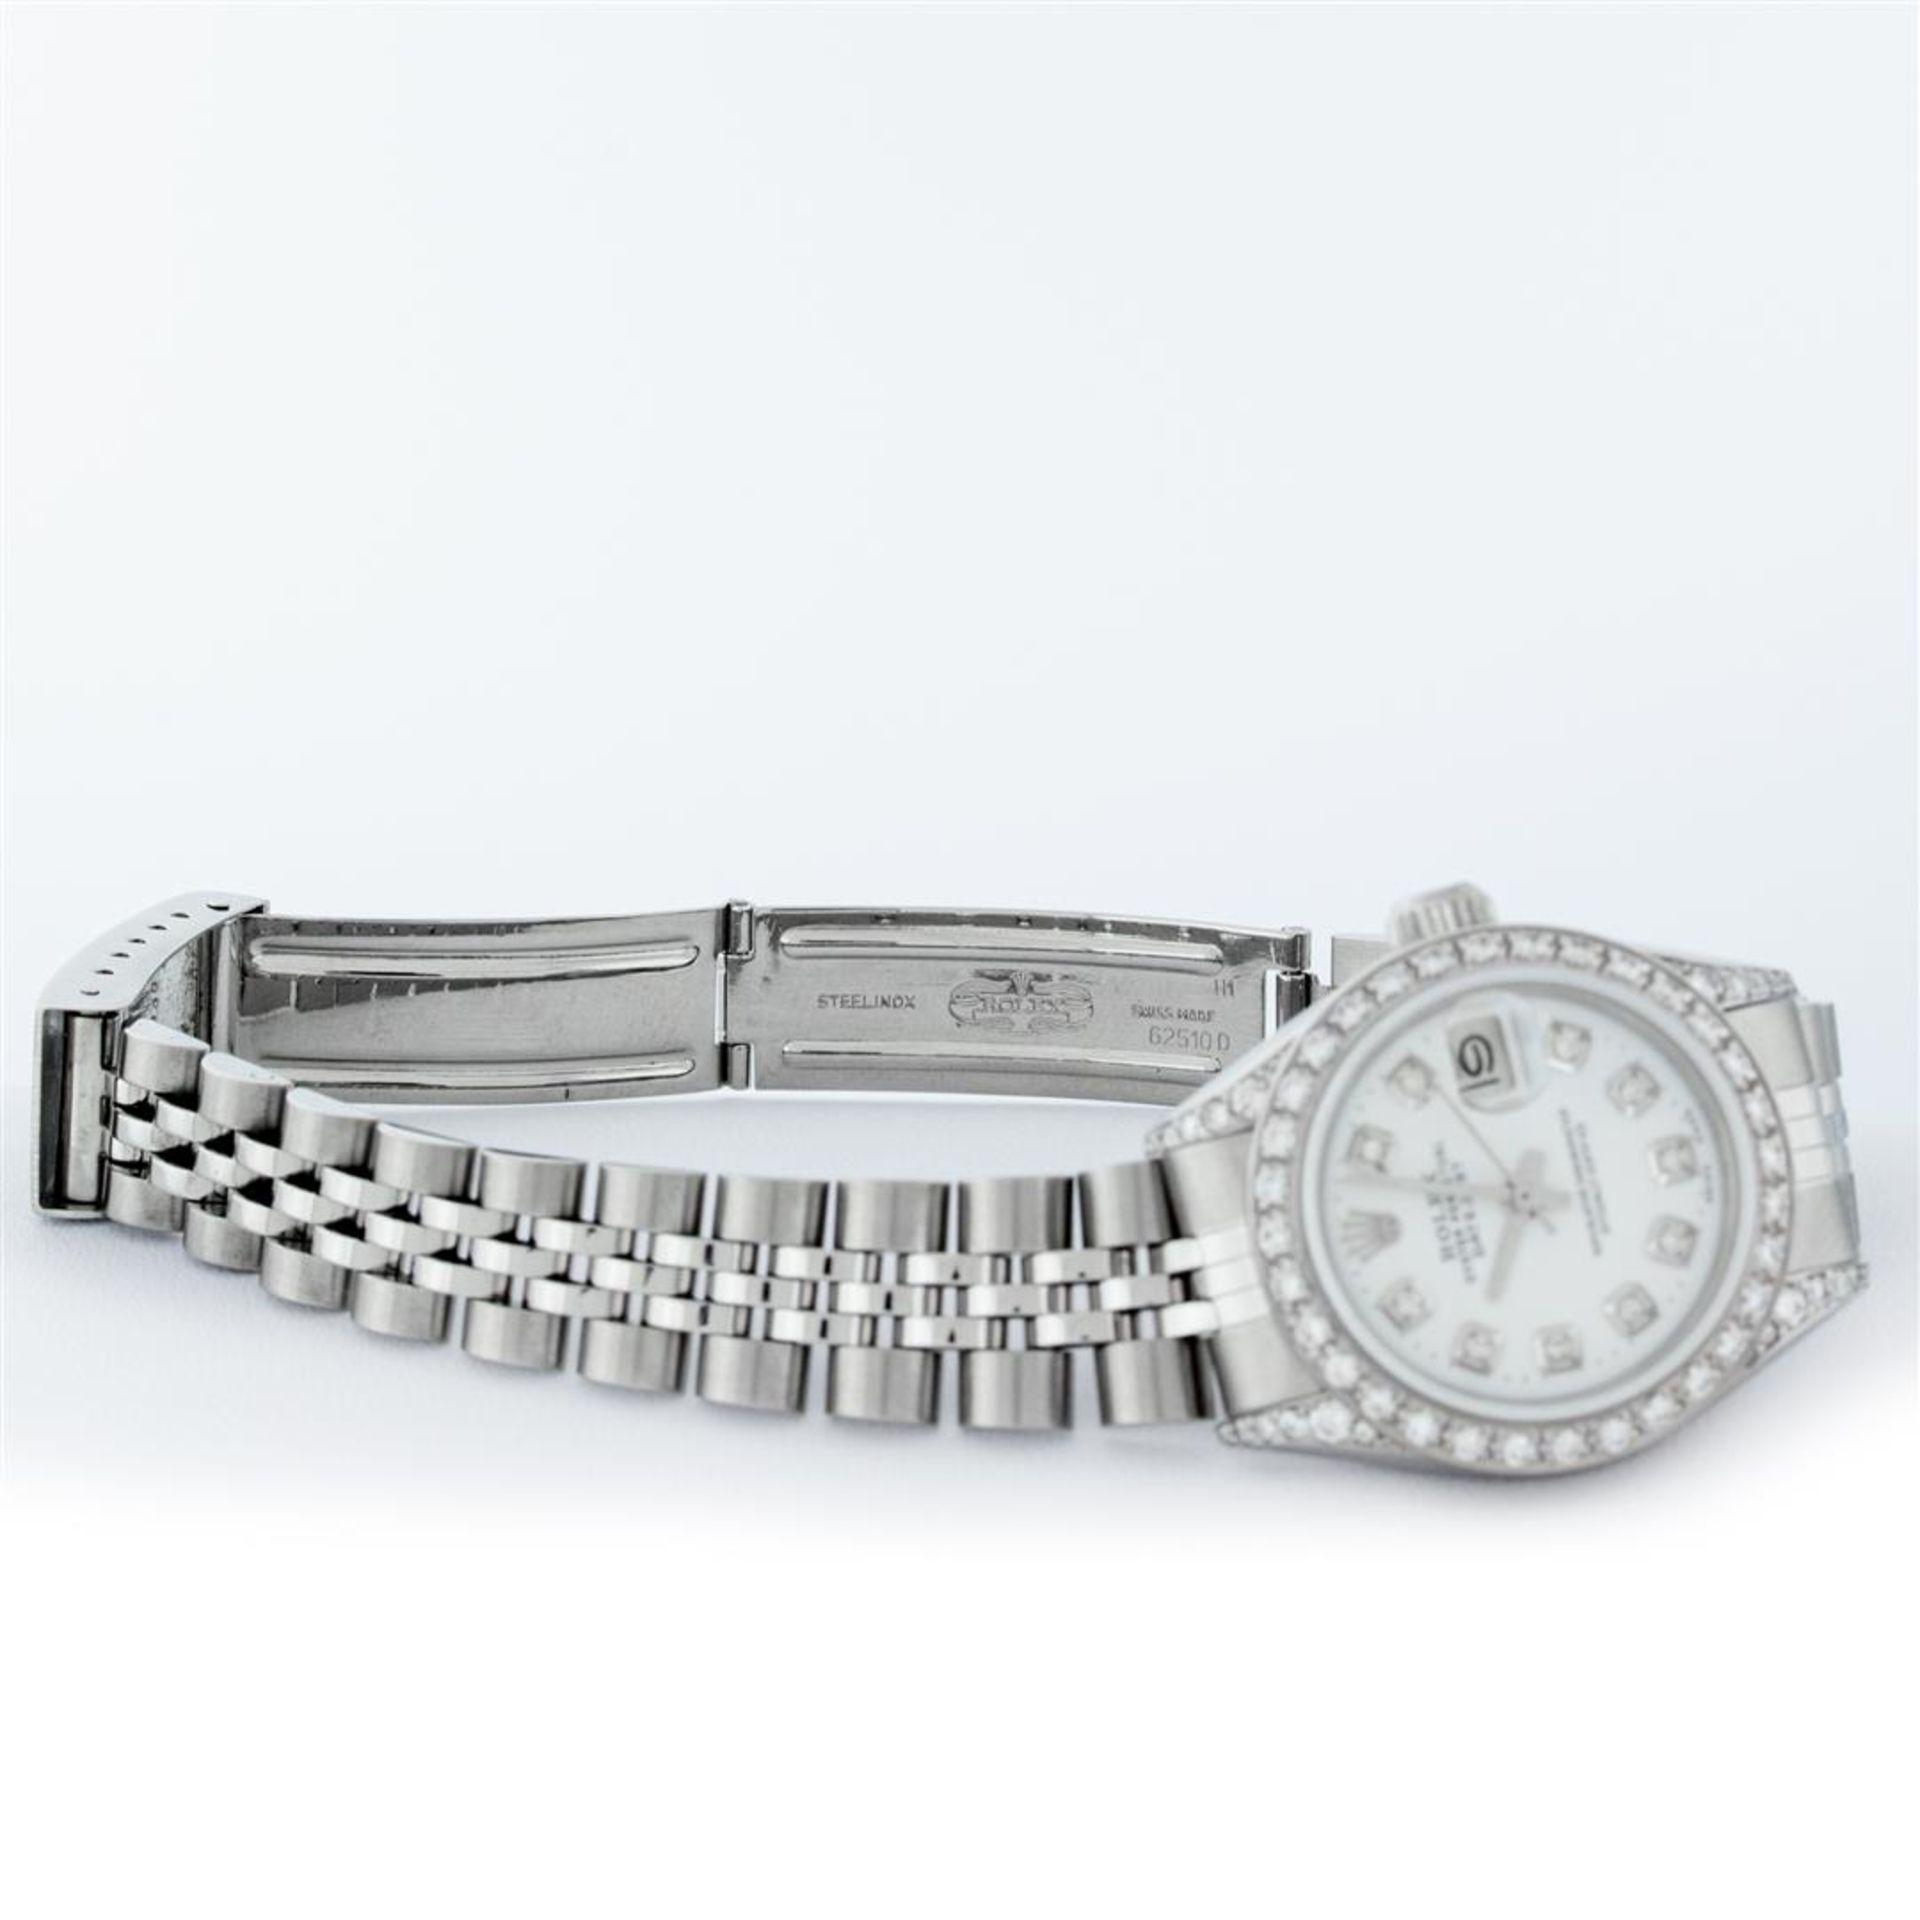 Rolex Ladies Stainless Steel White Diamond Lugs & Datejust Wristwatch - Image 8 of 9